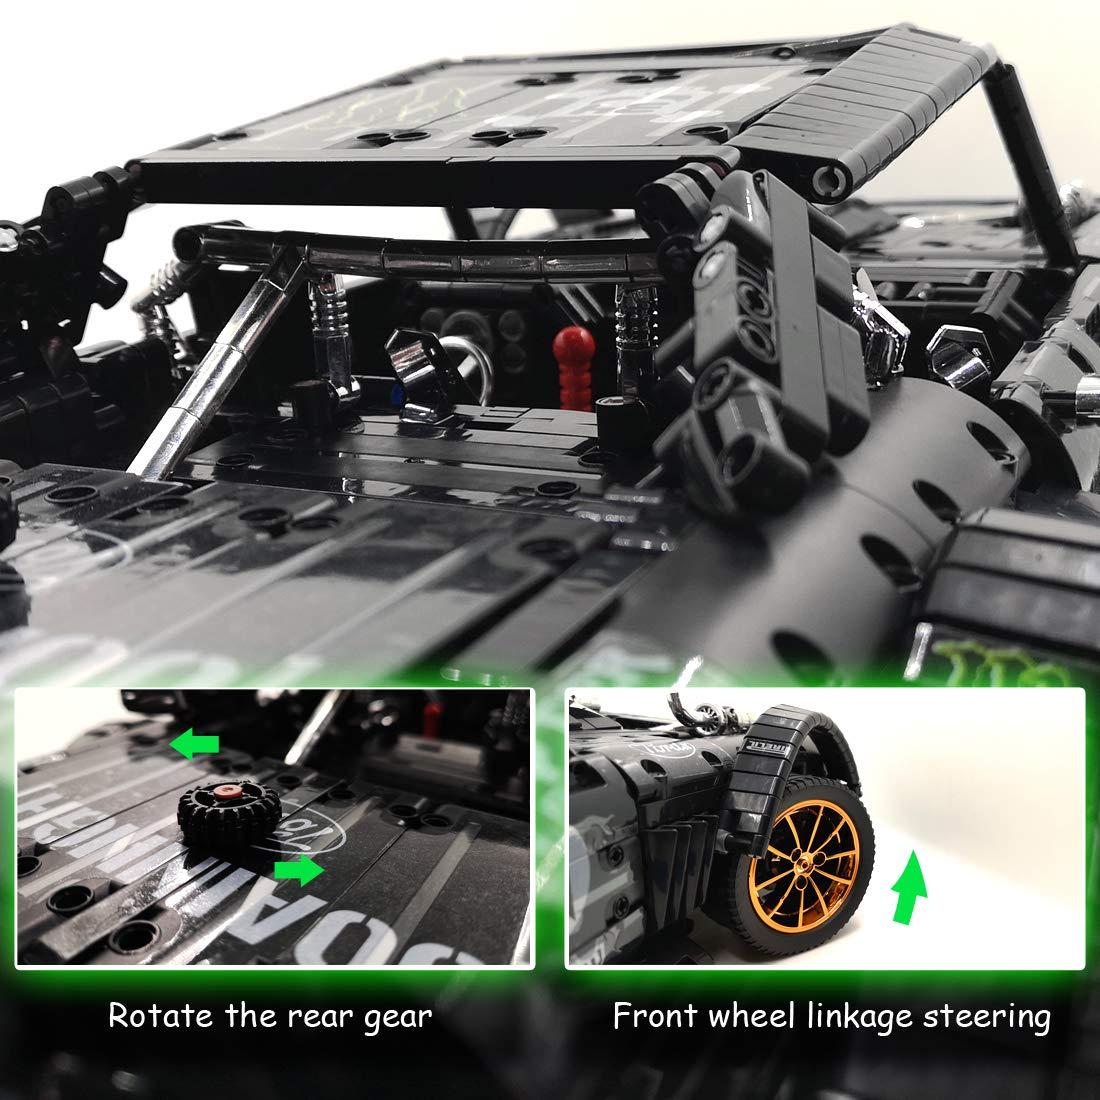 VIAHART Brain Flakes 2500 Piece Build /'n/' Build KitIncludes Wheels and Axels